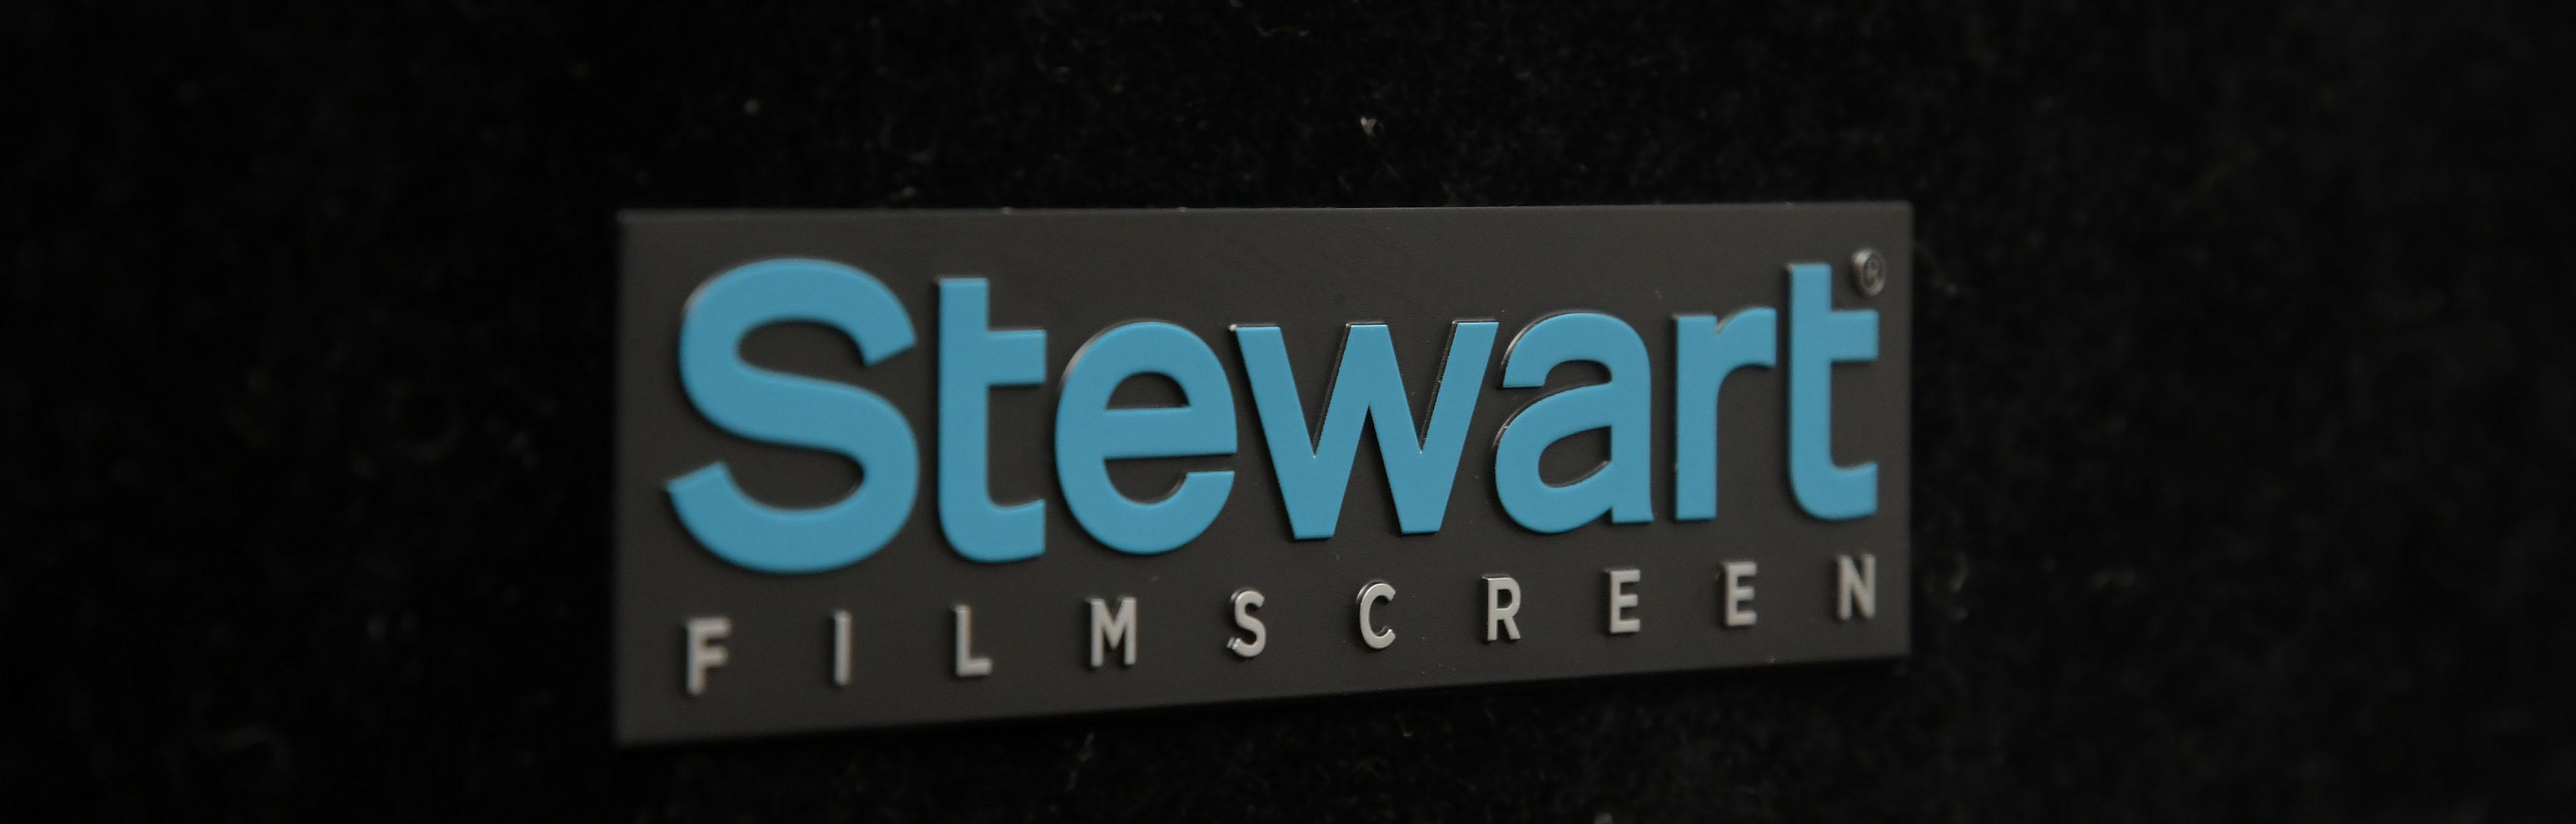 01 - Stewart - Logo auf Rahmen - Foto Michael B. Rehders